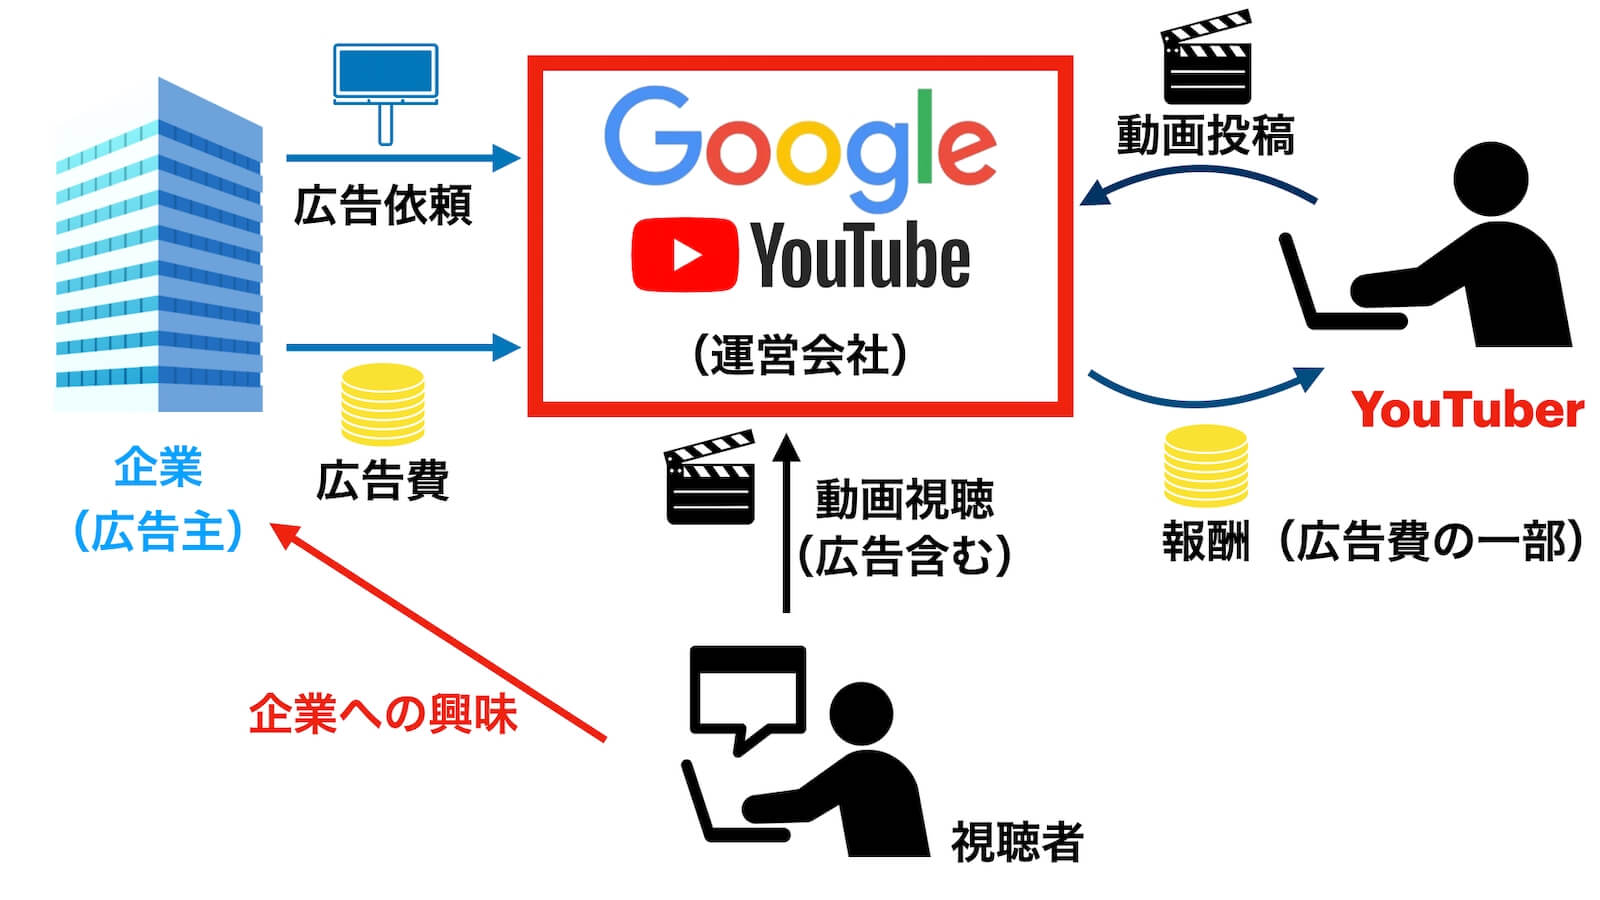 YouTube money flow correlation diagram